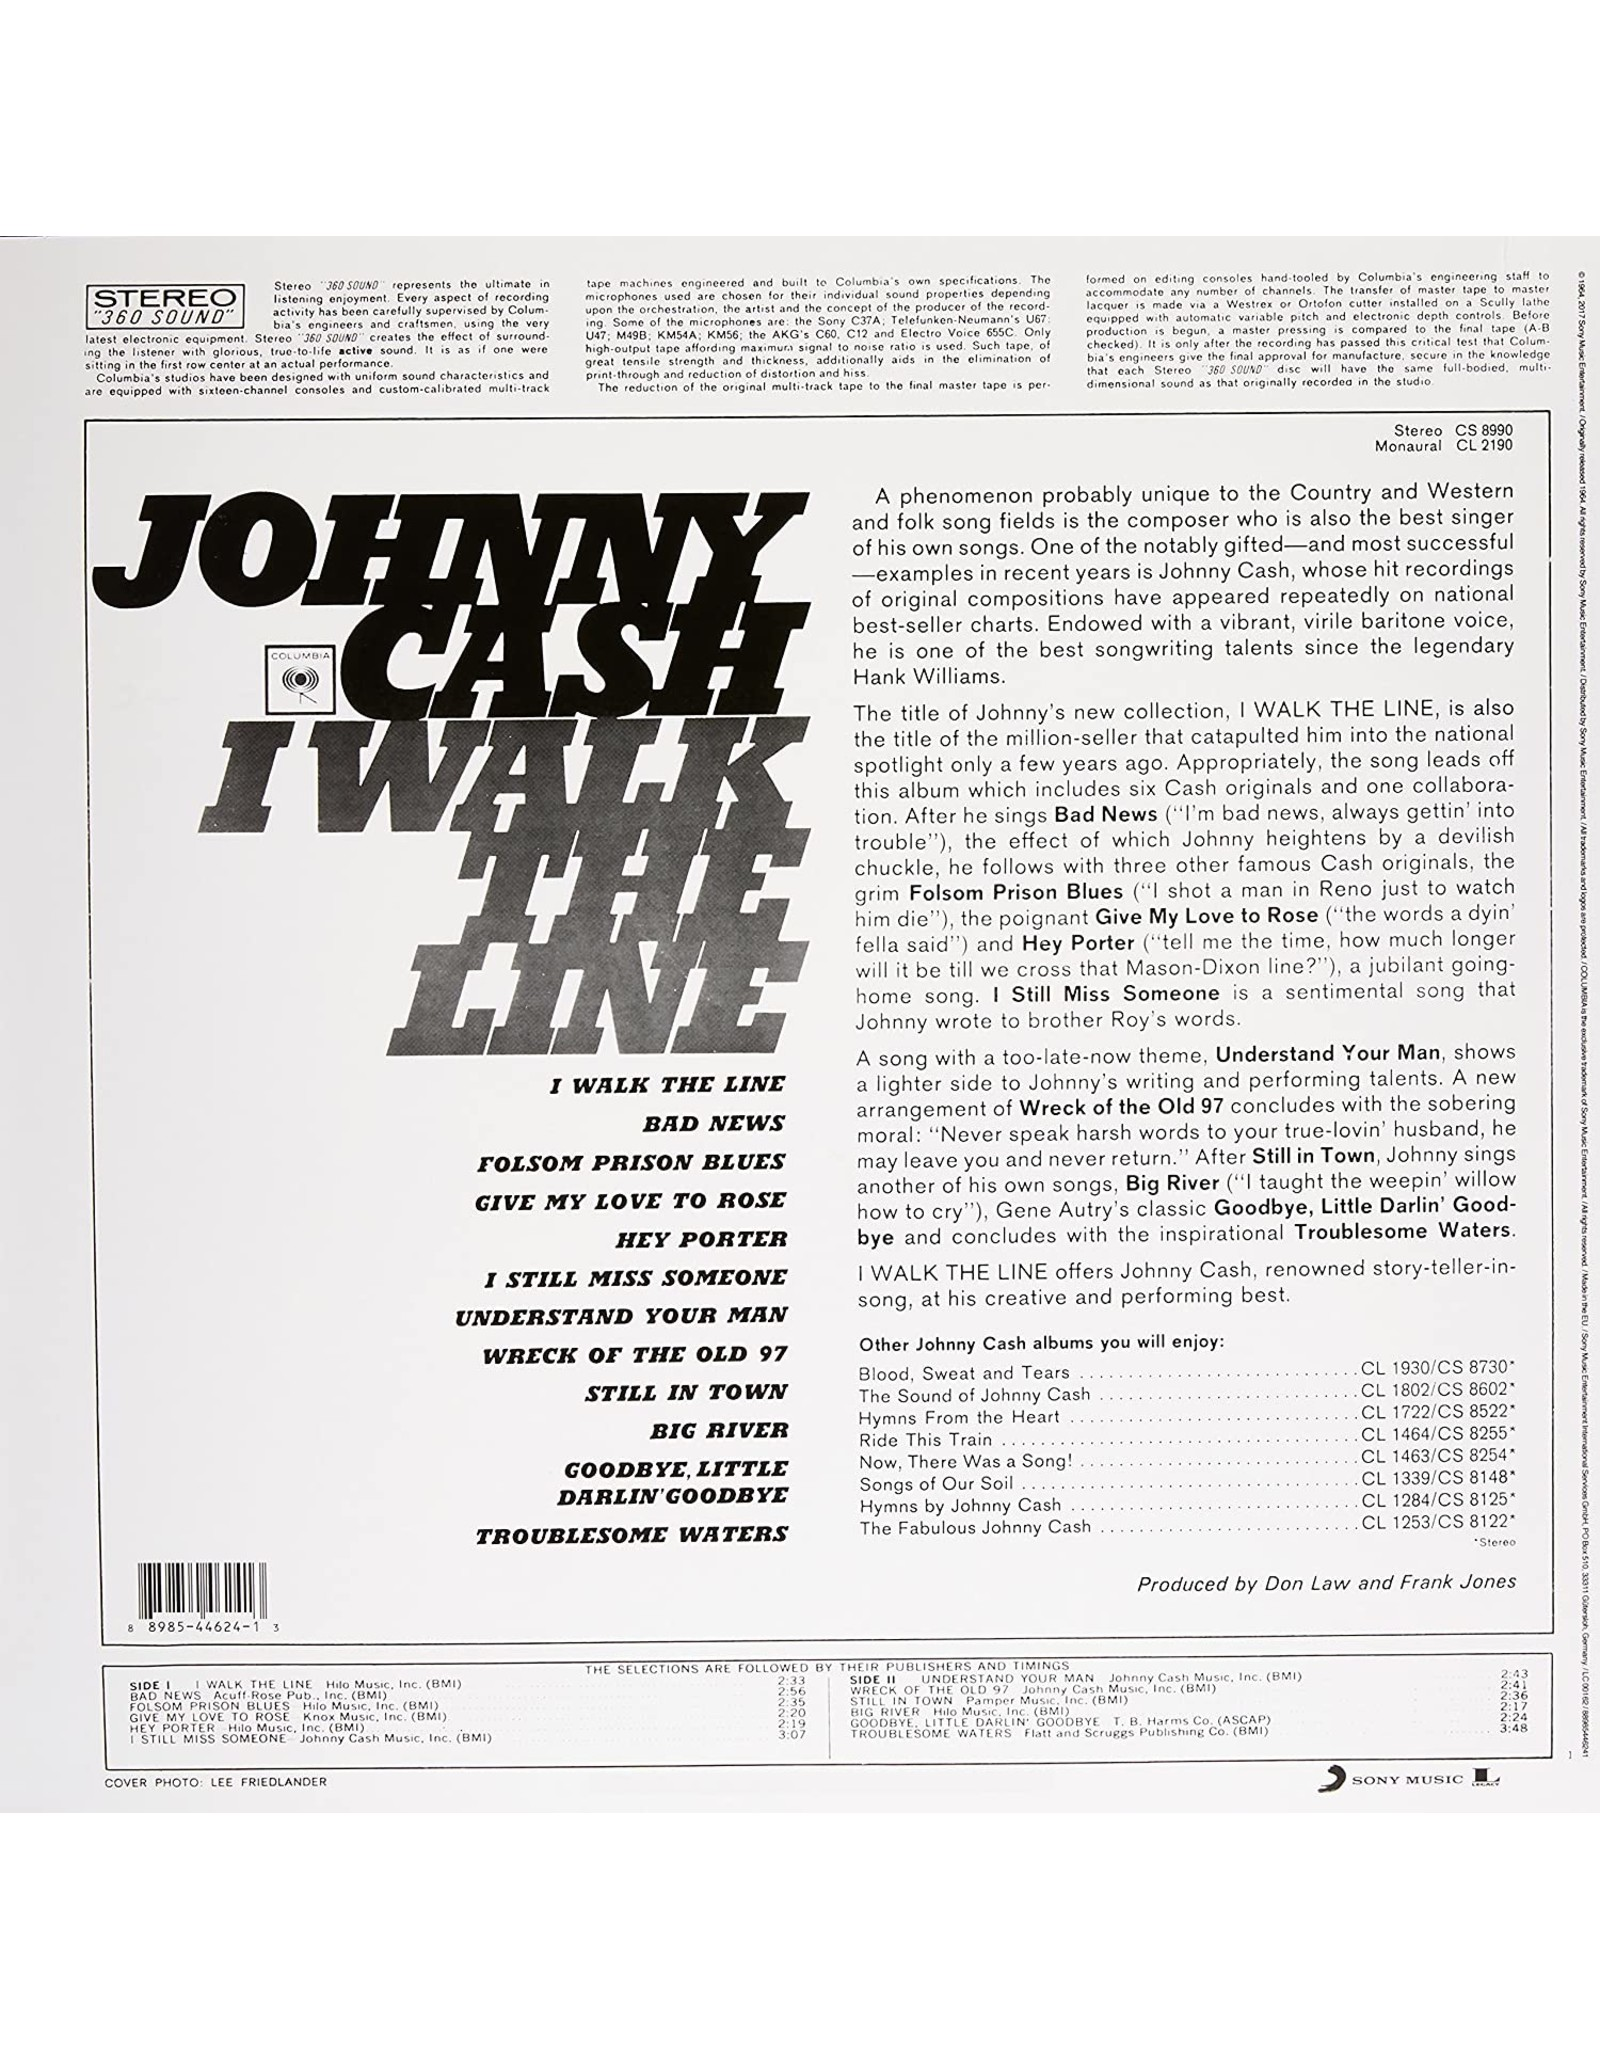 Johnny Cash - I Walk The Line (Greatest Hits)